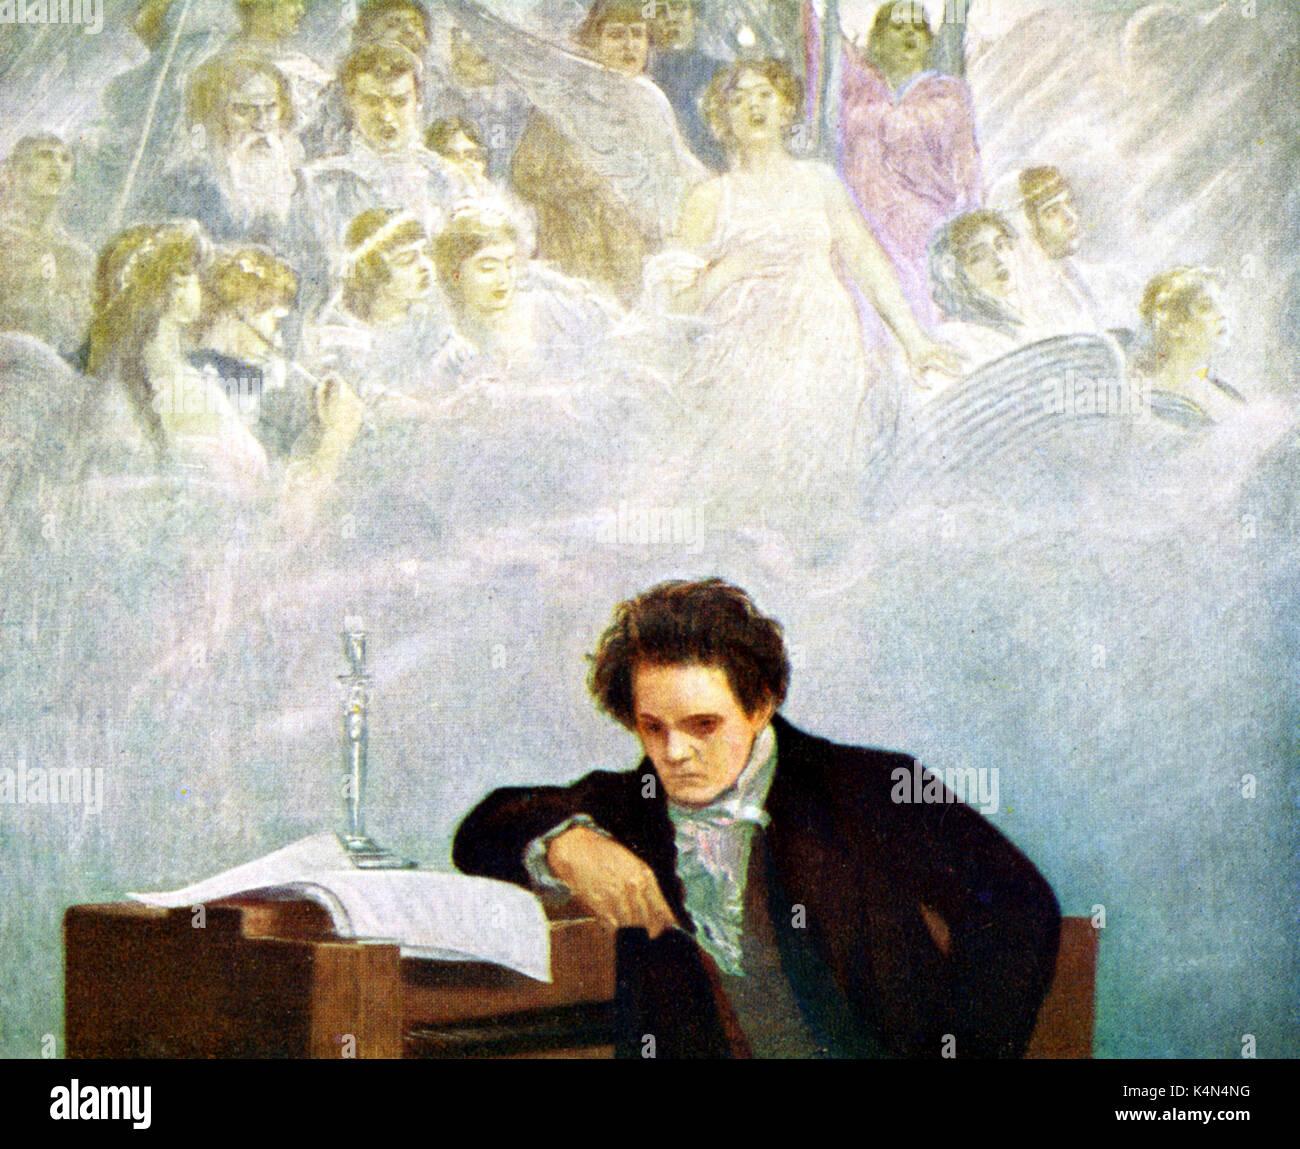 Ludwig van  Beethoven.  Portrait by Hans Temple(1857-1931).  L van B: German composer, 17 December  1770- 26 March 1827 - Stock Image